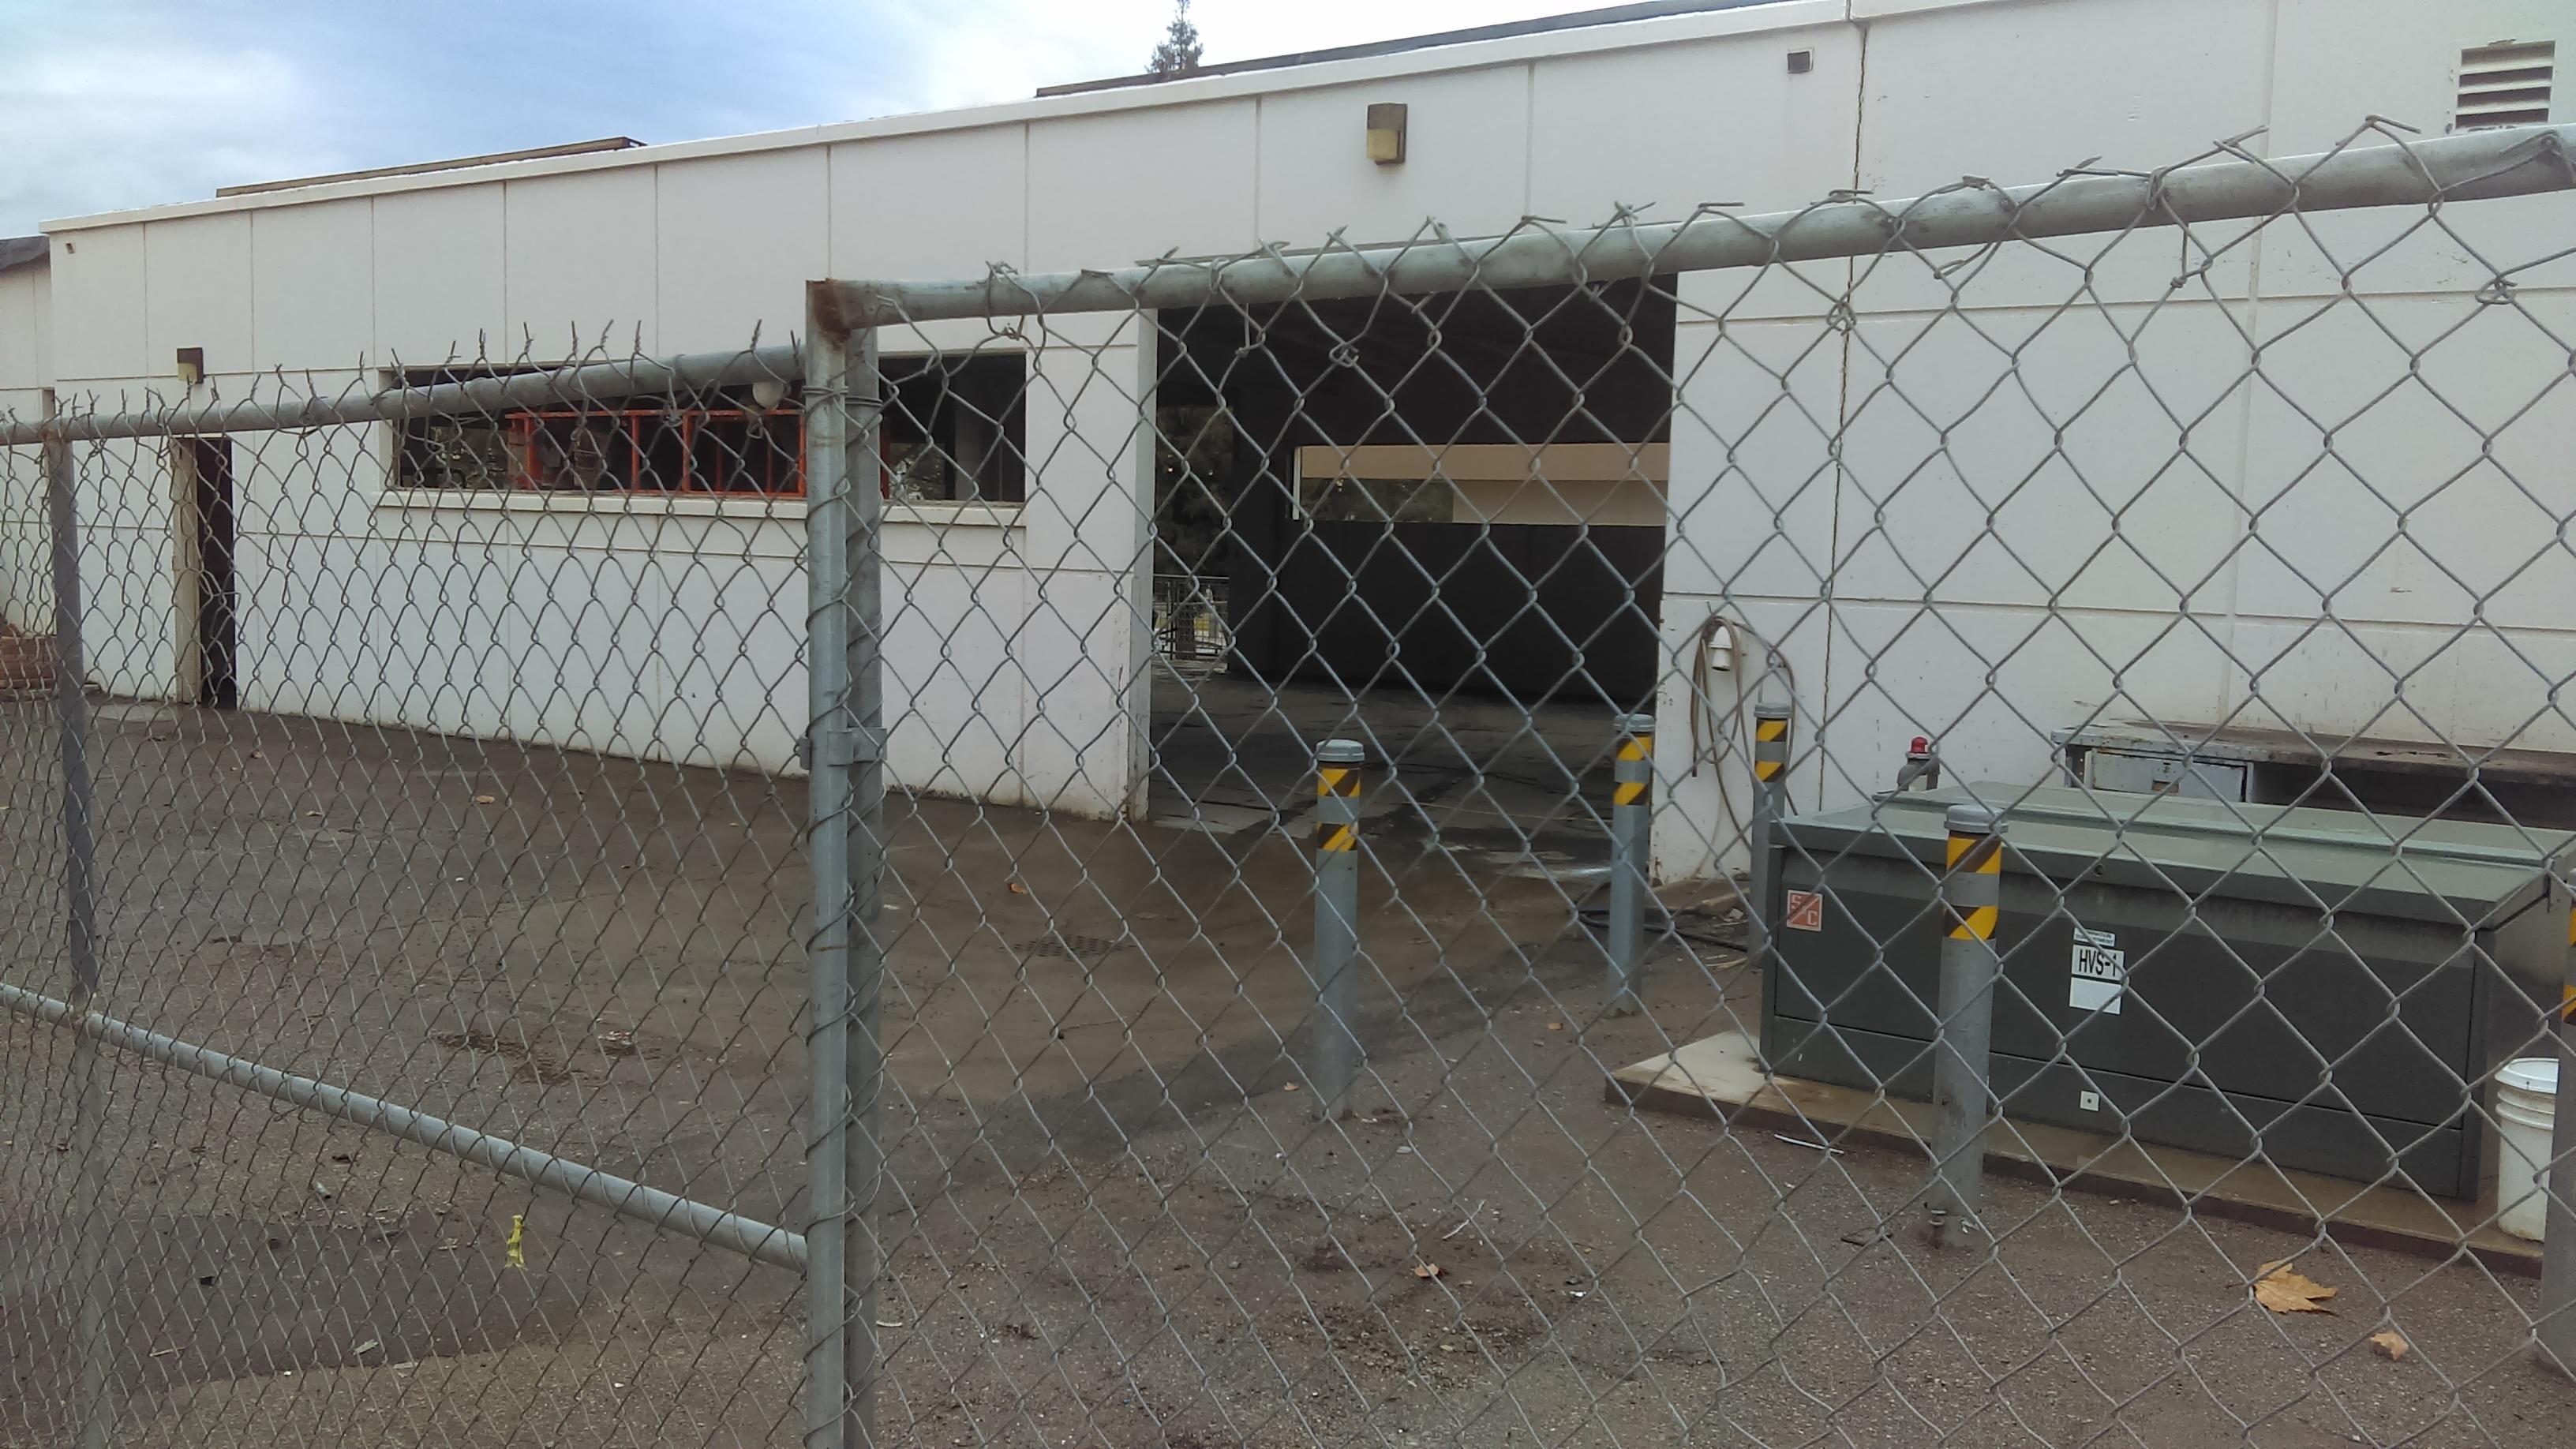 Progress picture of STEM Center transformation when it was a garage